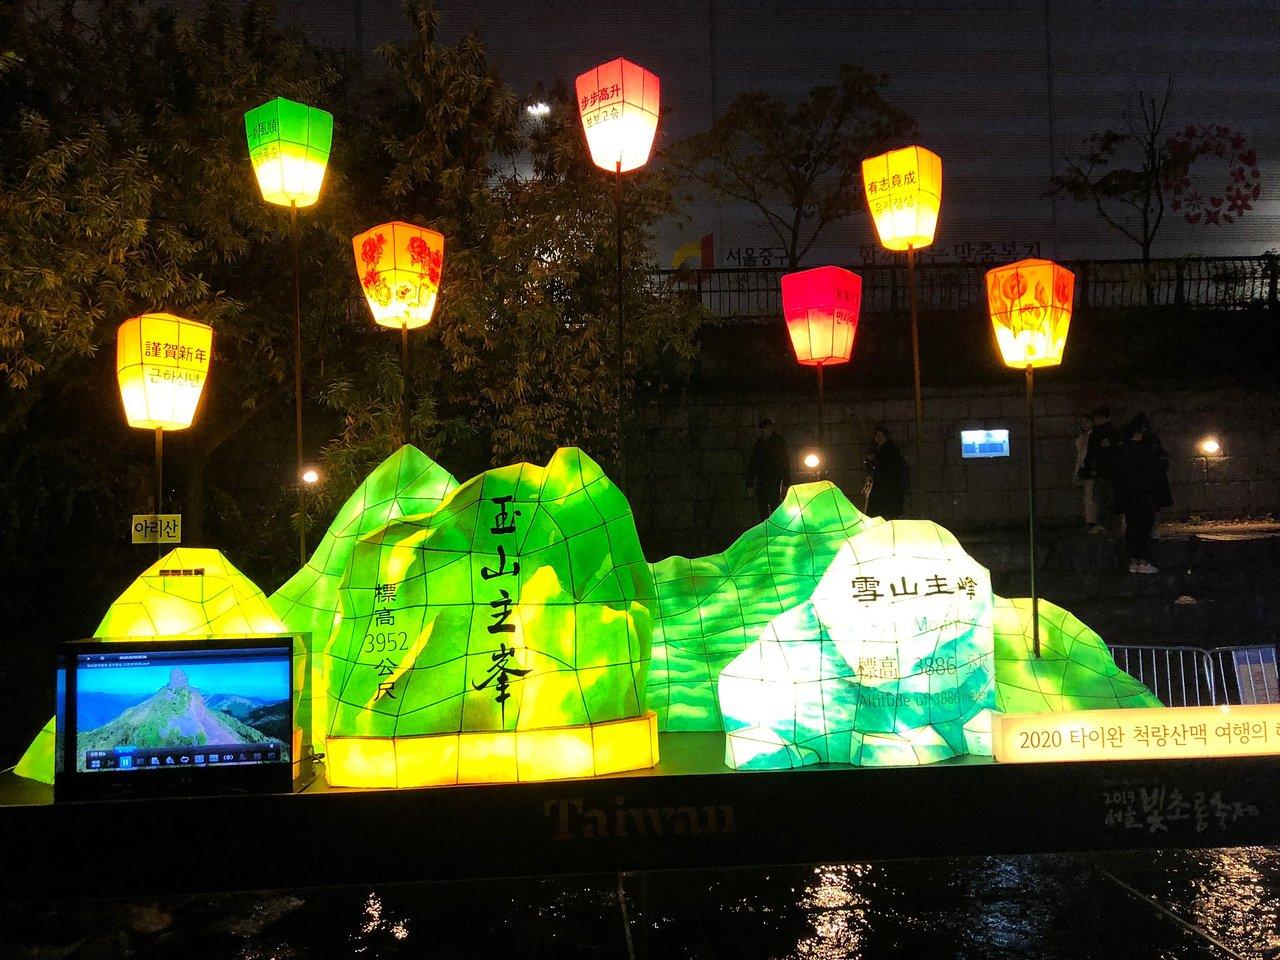 Seoul Lantern Festival 2021 All You Need To Know Before You Go With Photos Tripadvisor